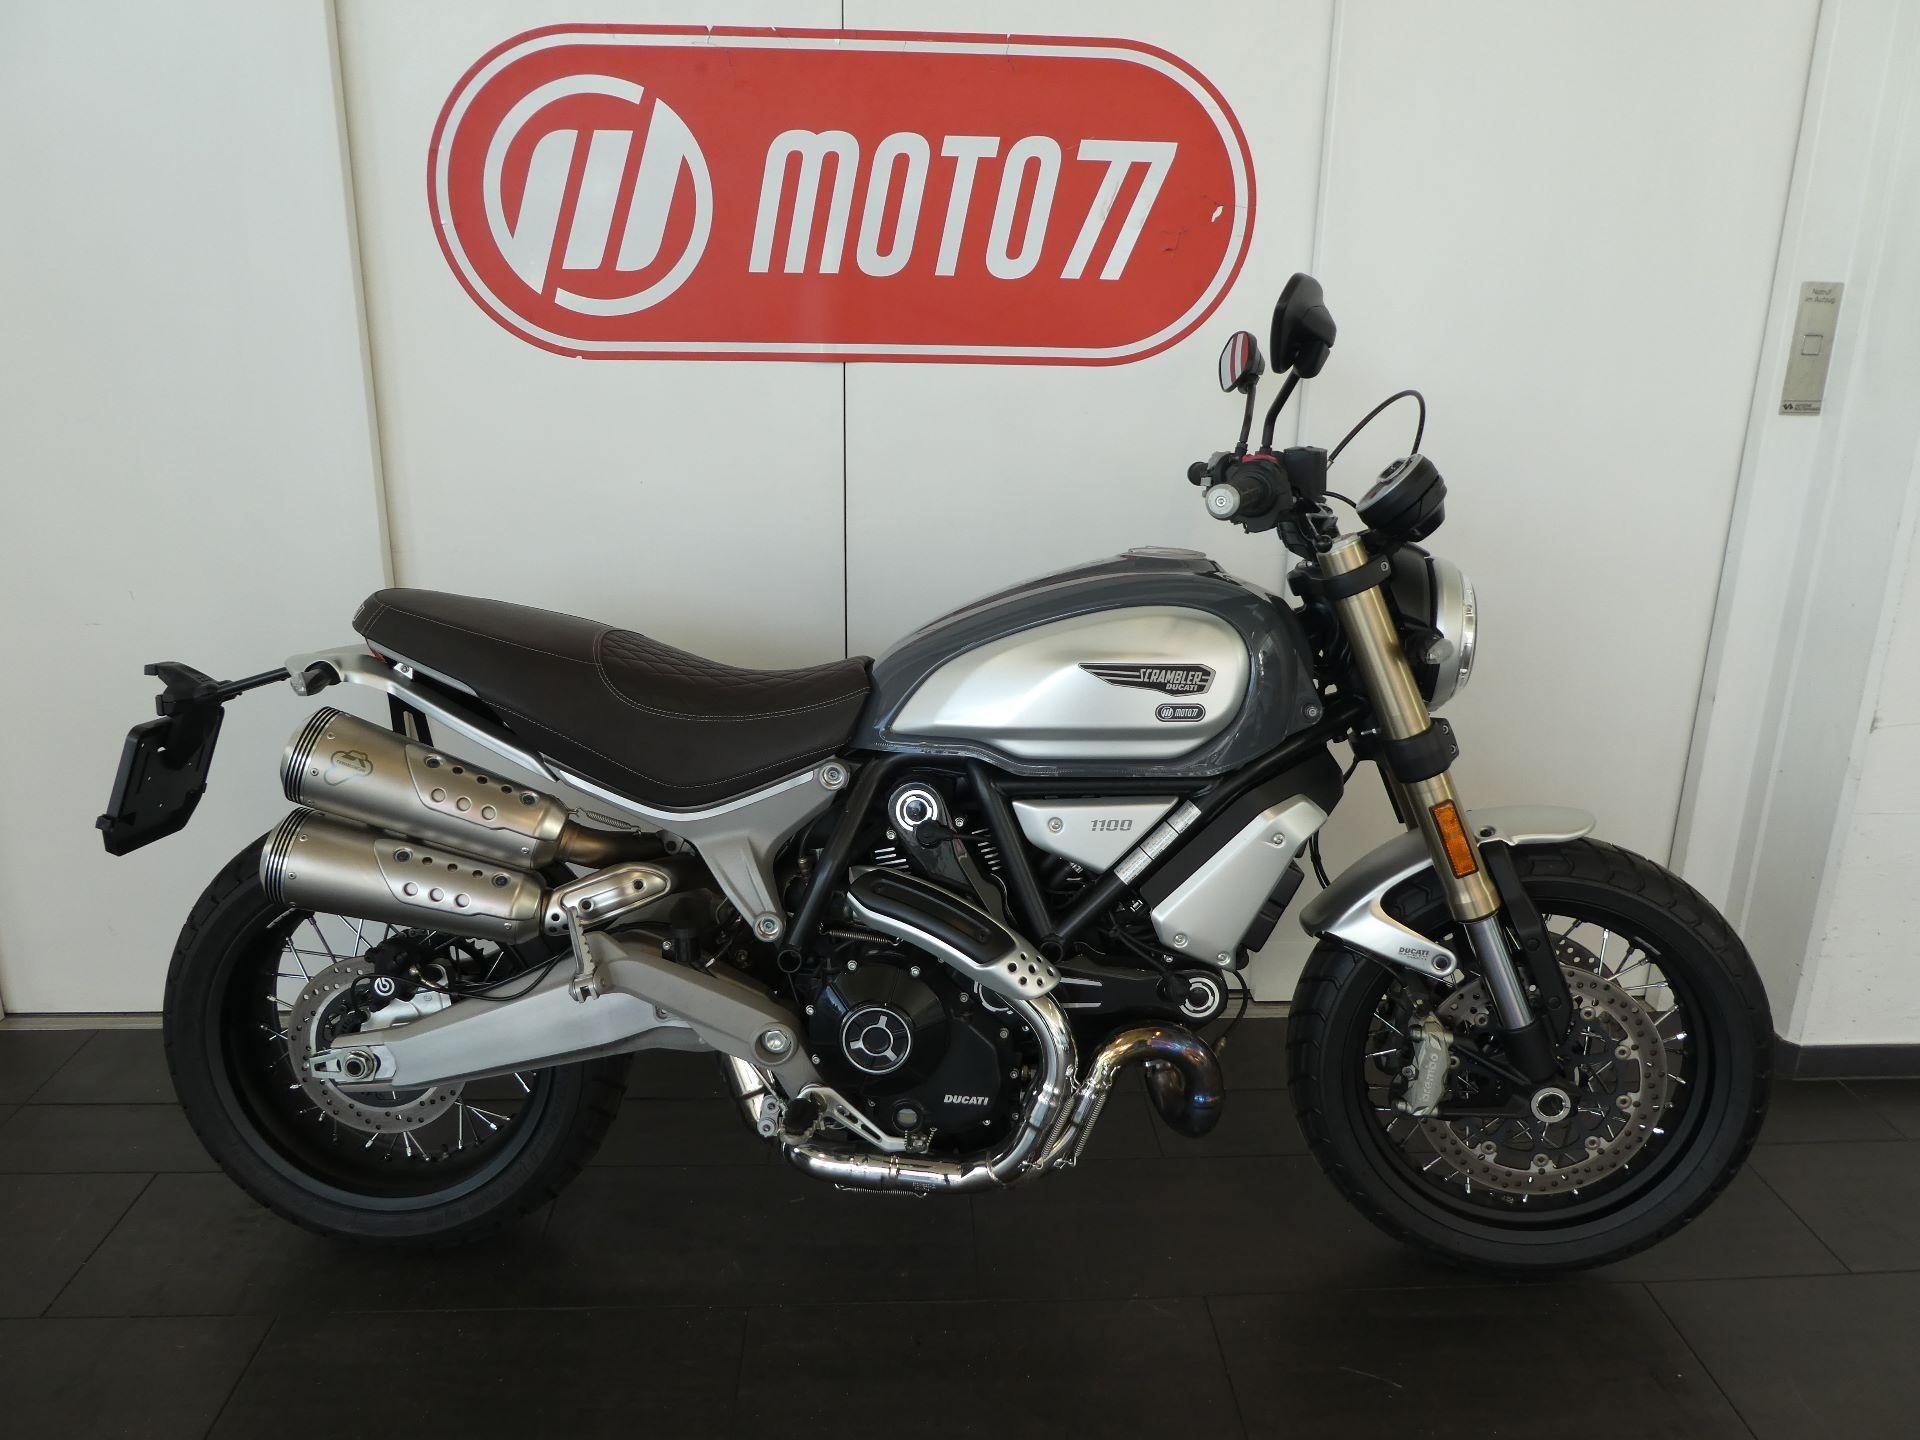 Motorrad Mieten & Roller Mieten DUCATI Spezial Scrambler 1100